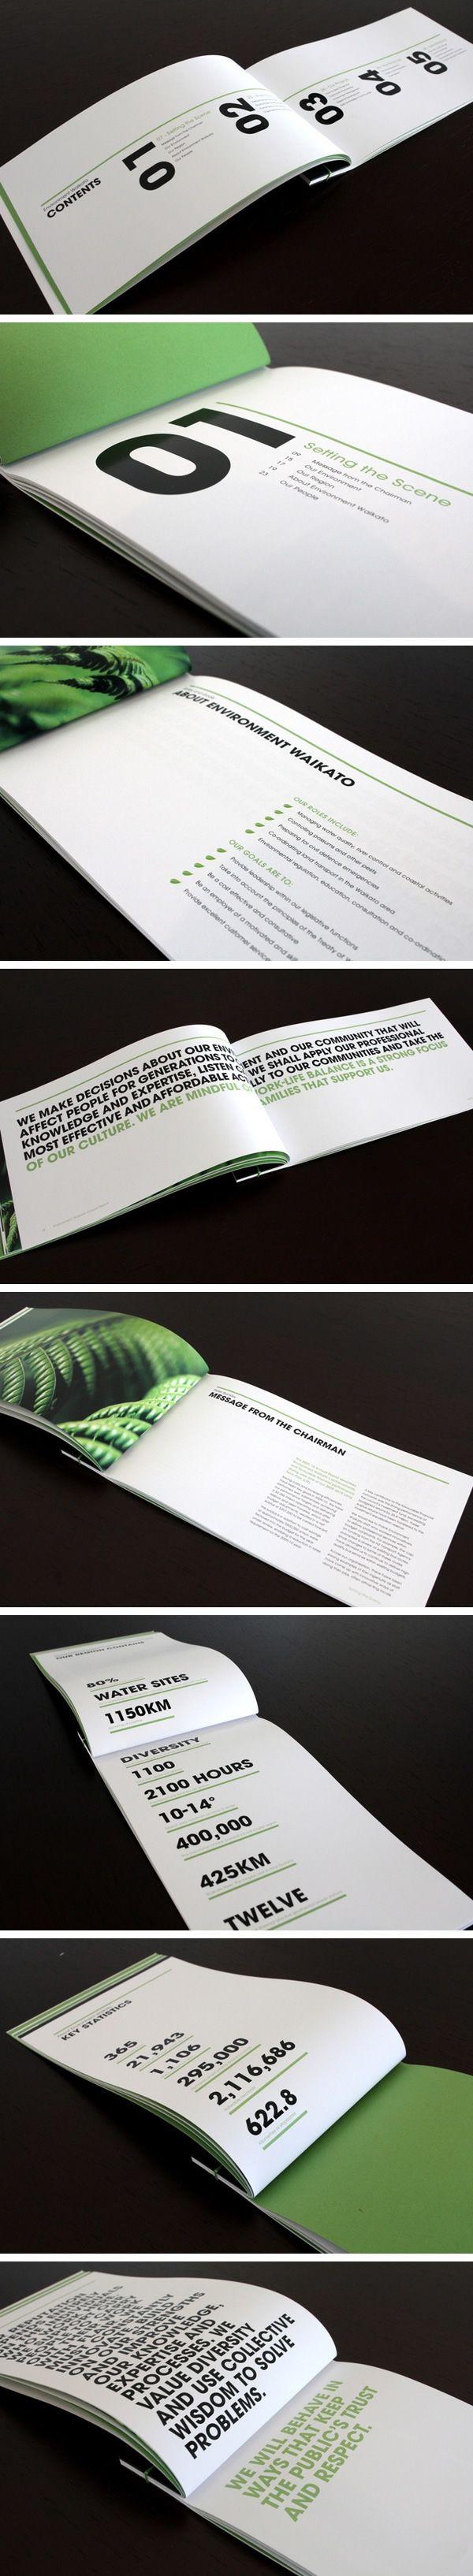 raewyn brandon | environment waikato annual report